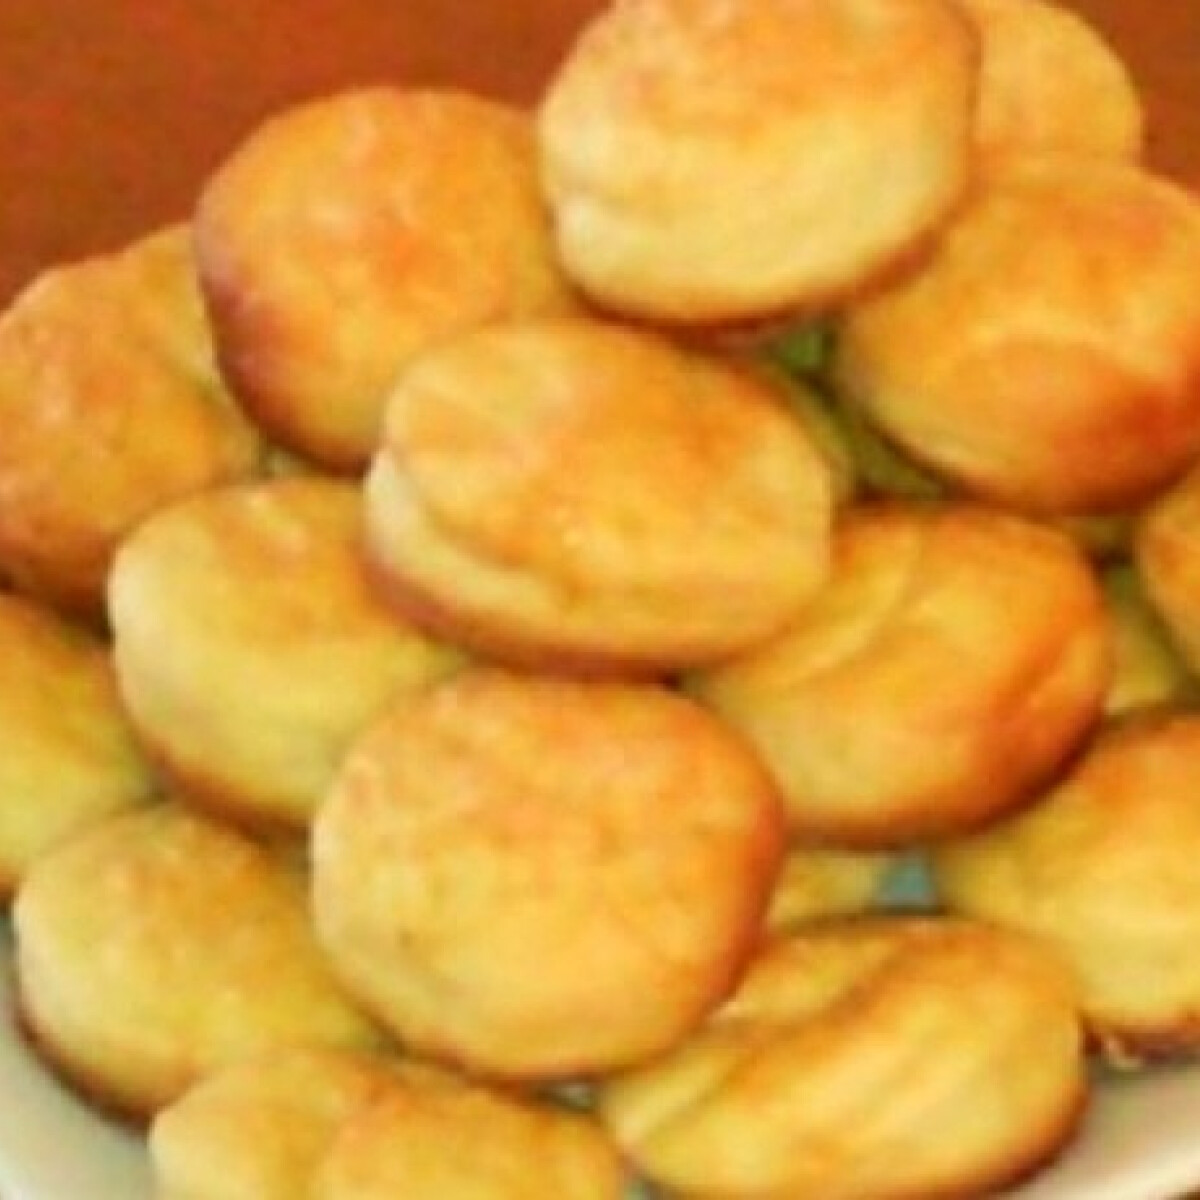 Sajtos-tejfölös-krumplis pogi